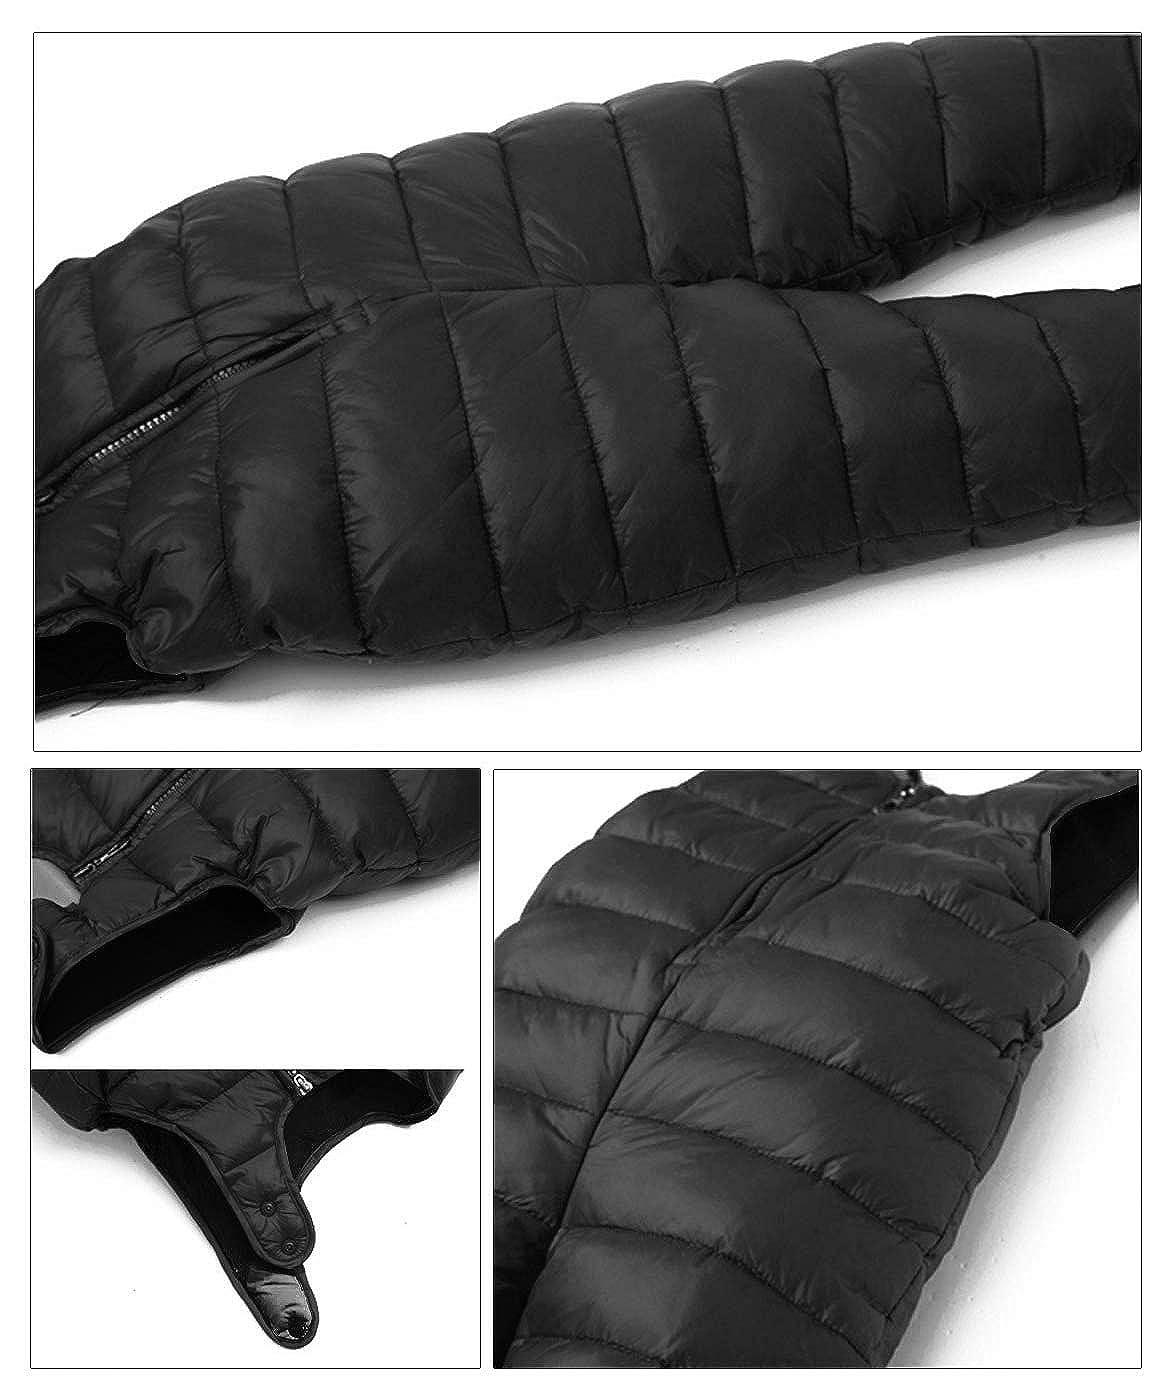 Happy Cherry Unisex Baby Winter Down Overalls Zipper up Bib Pants Romper Warm Sleeveless Jumpsuit